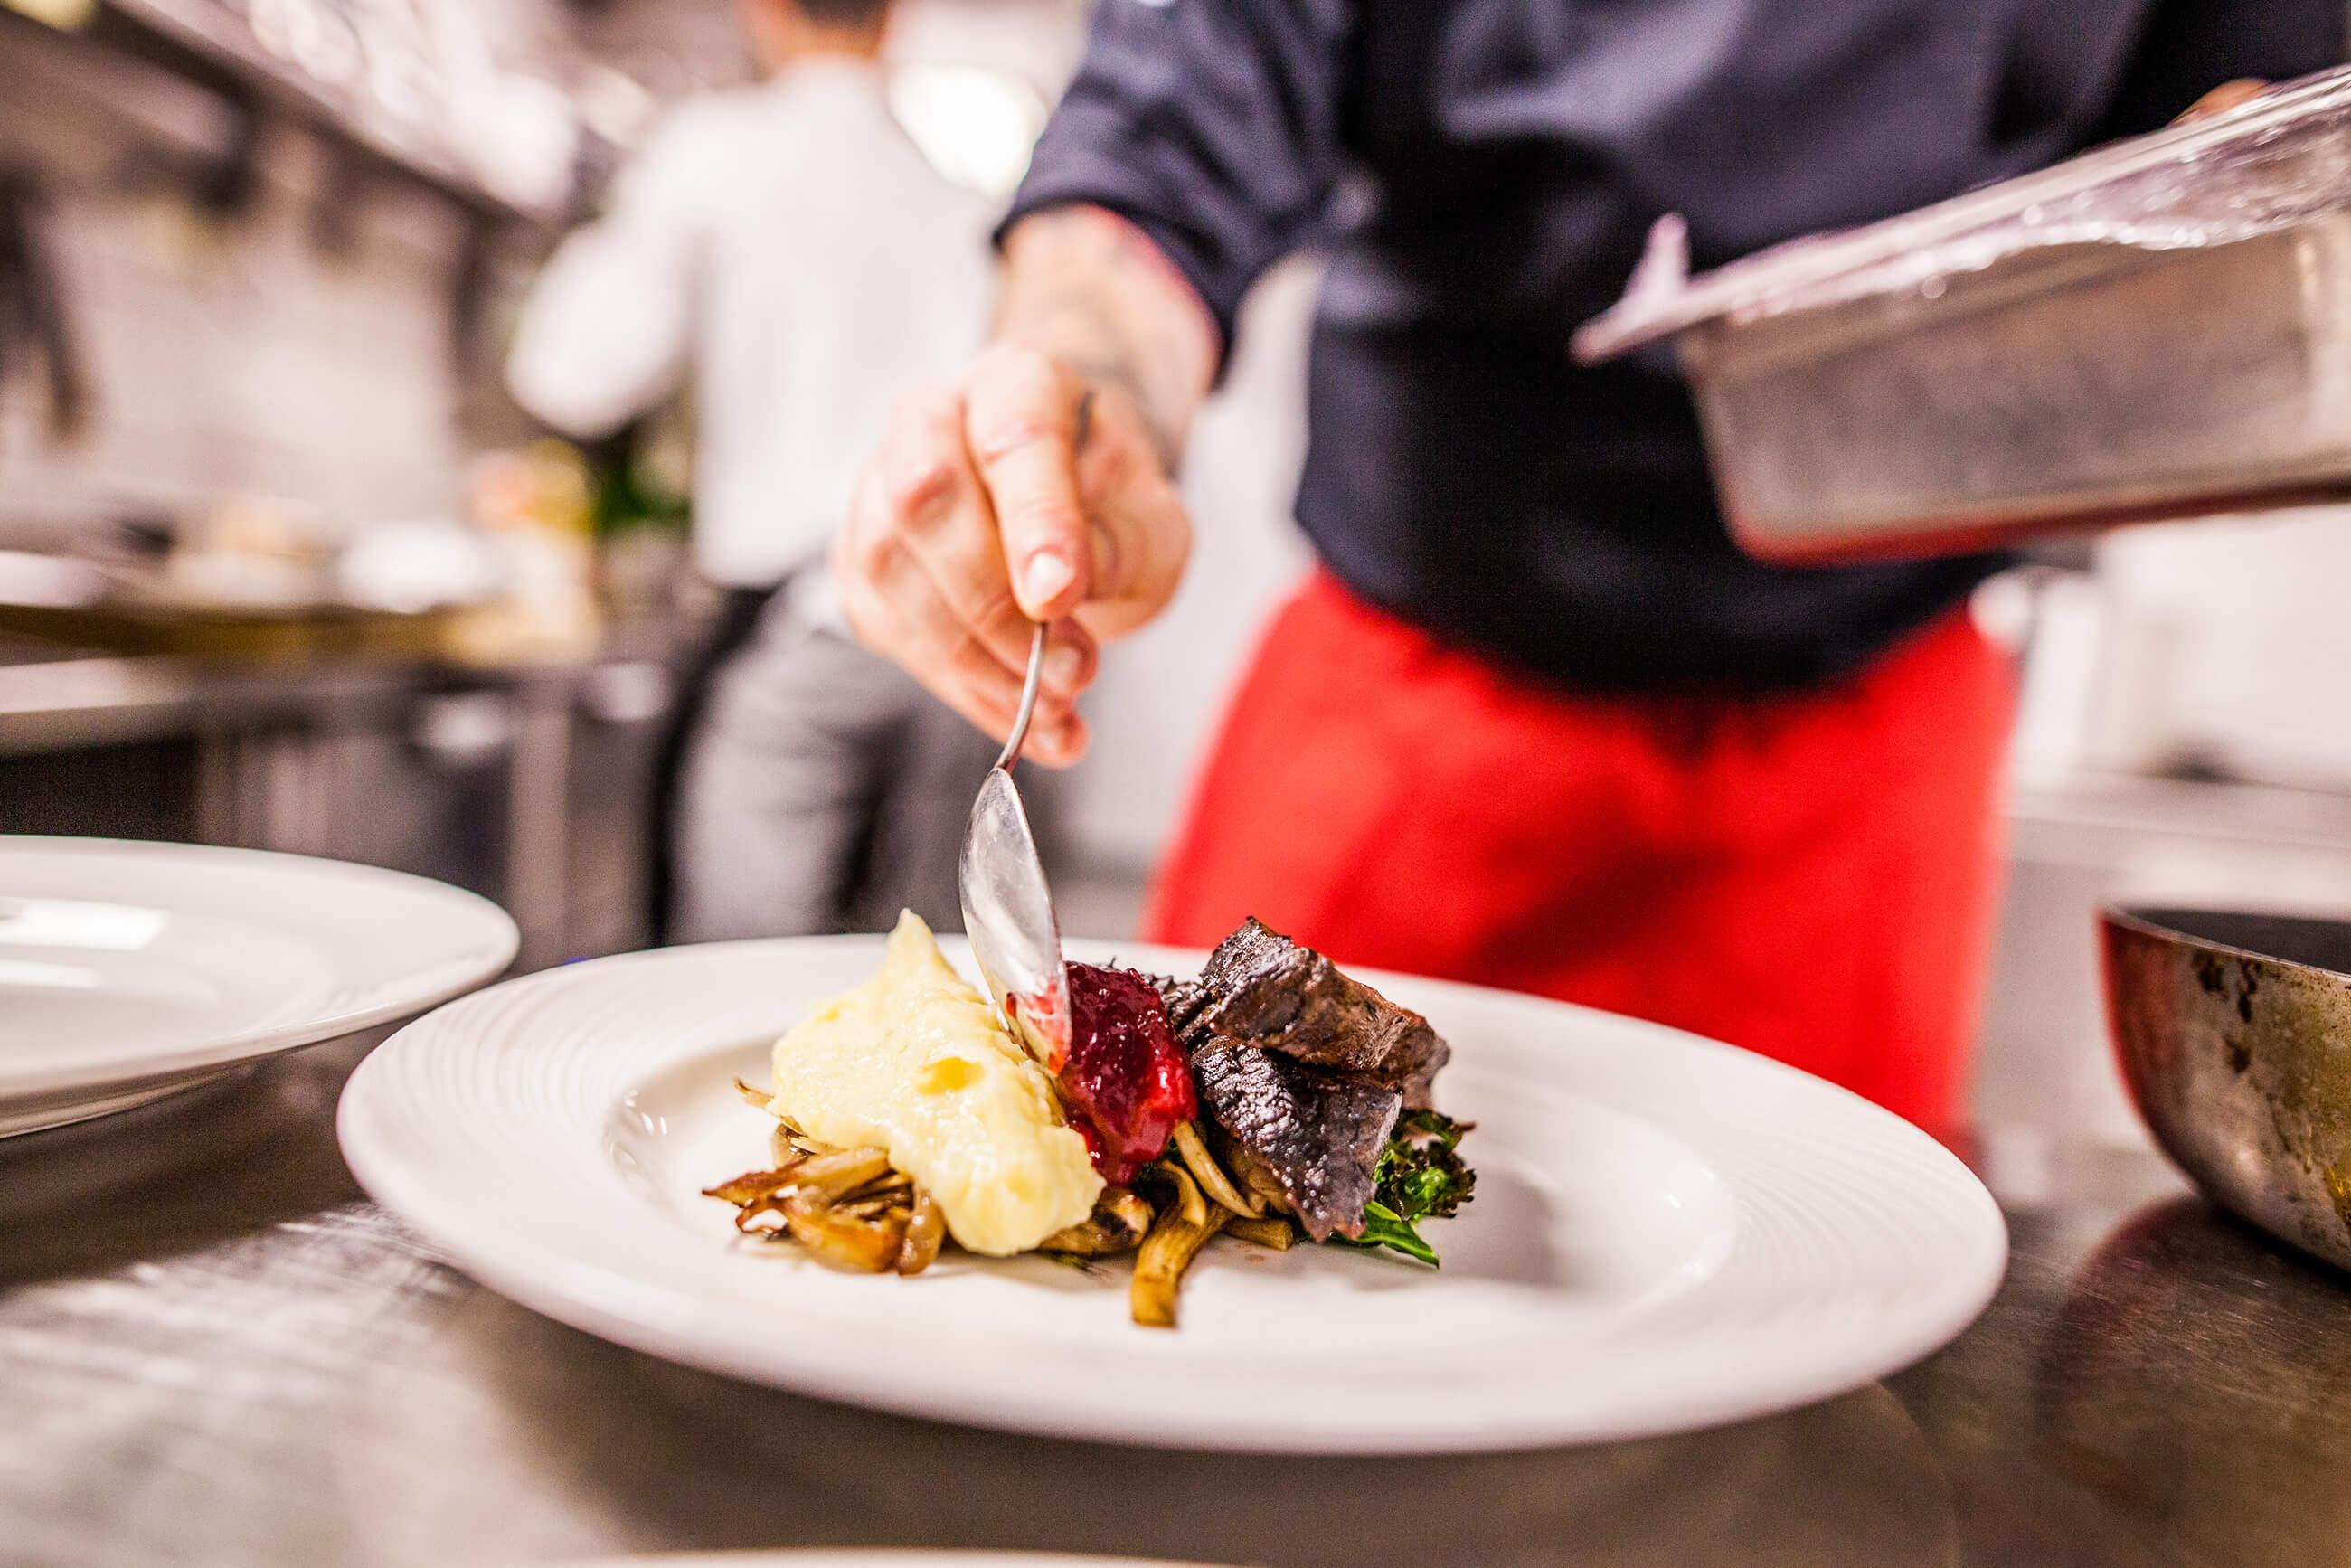 https://bubo.sk/uploads/galleries/5044/middag-pa-restauranten-altona-vinbar-082018-99-1744--foto_martin_h-c3-a5ndlykken.jpg